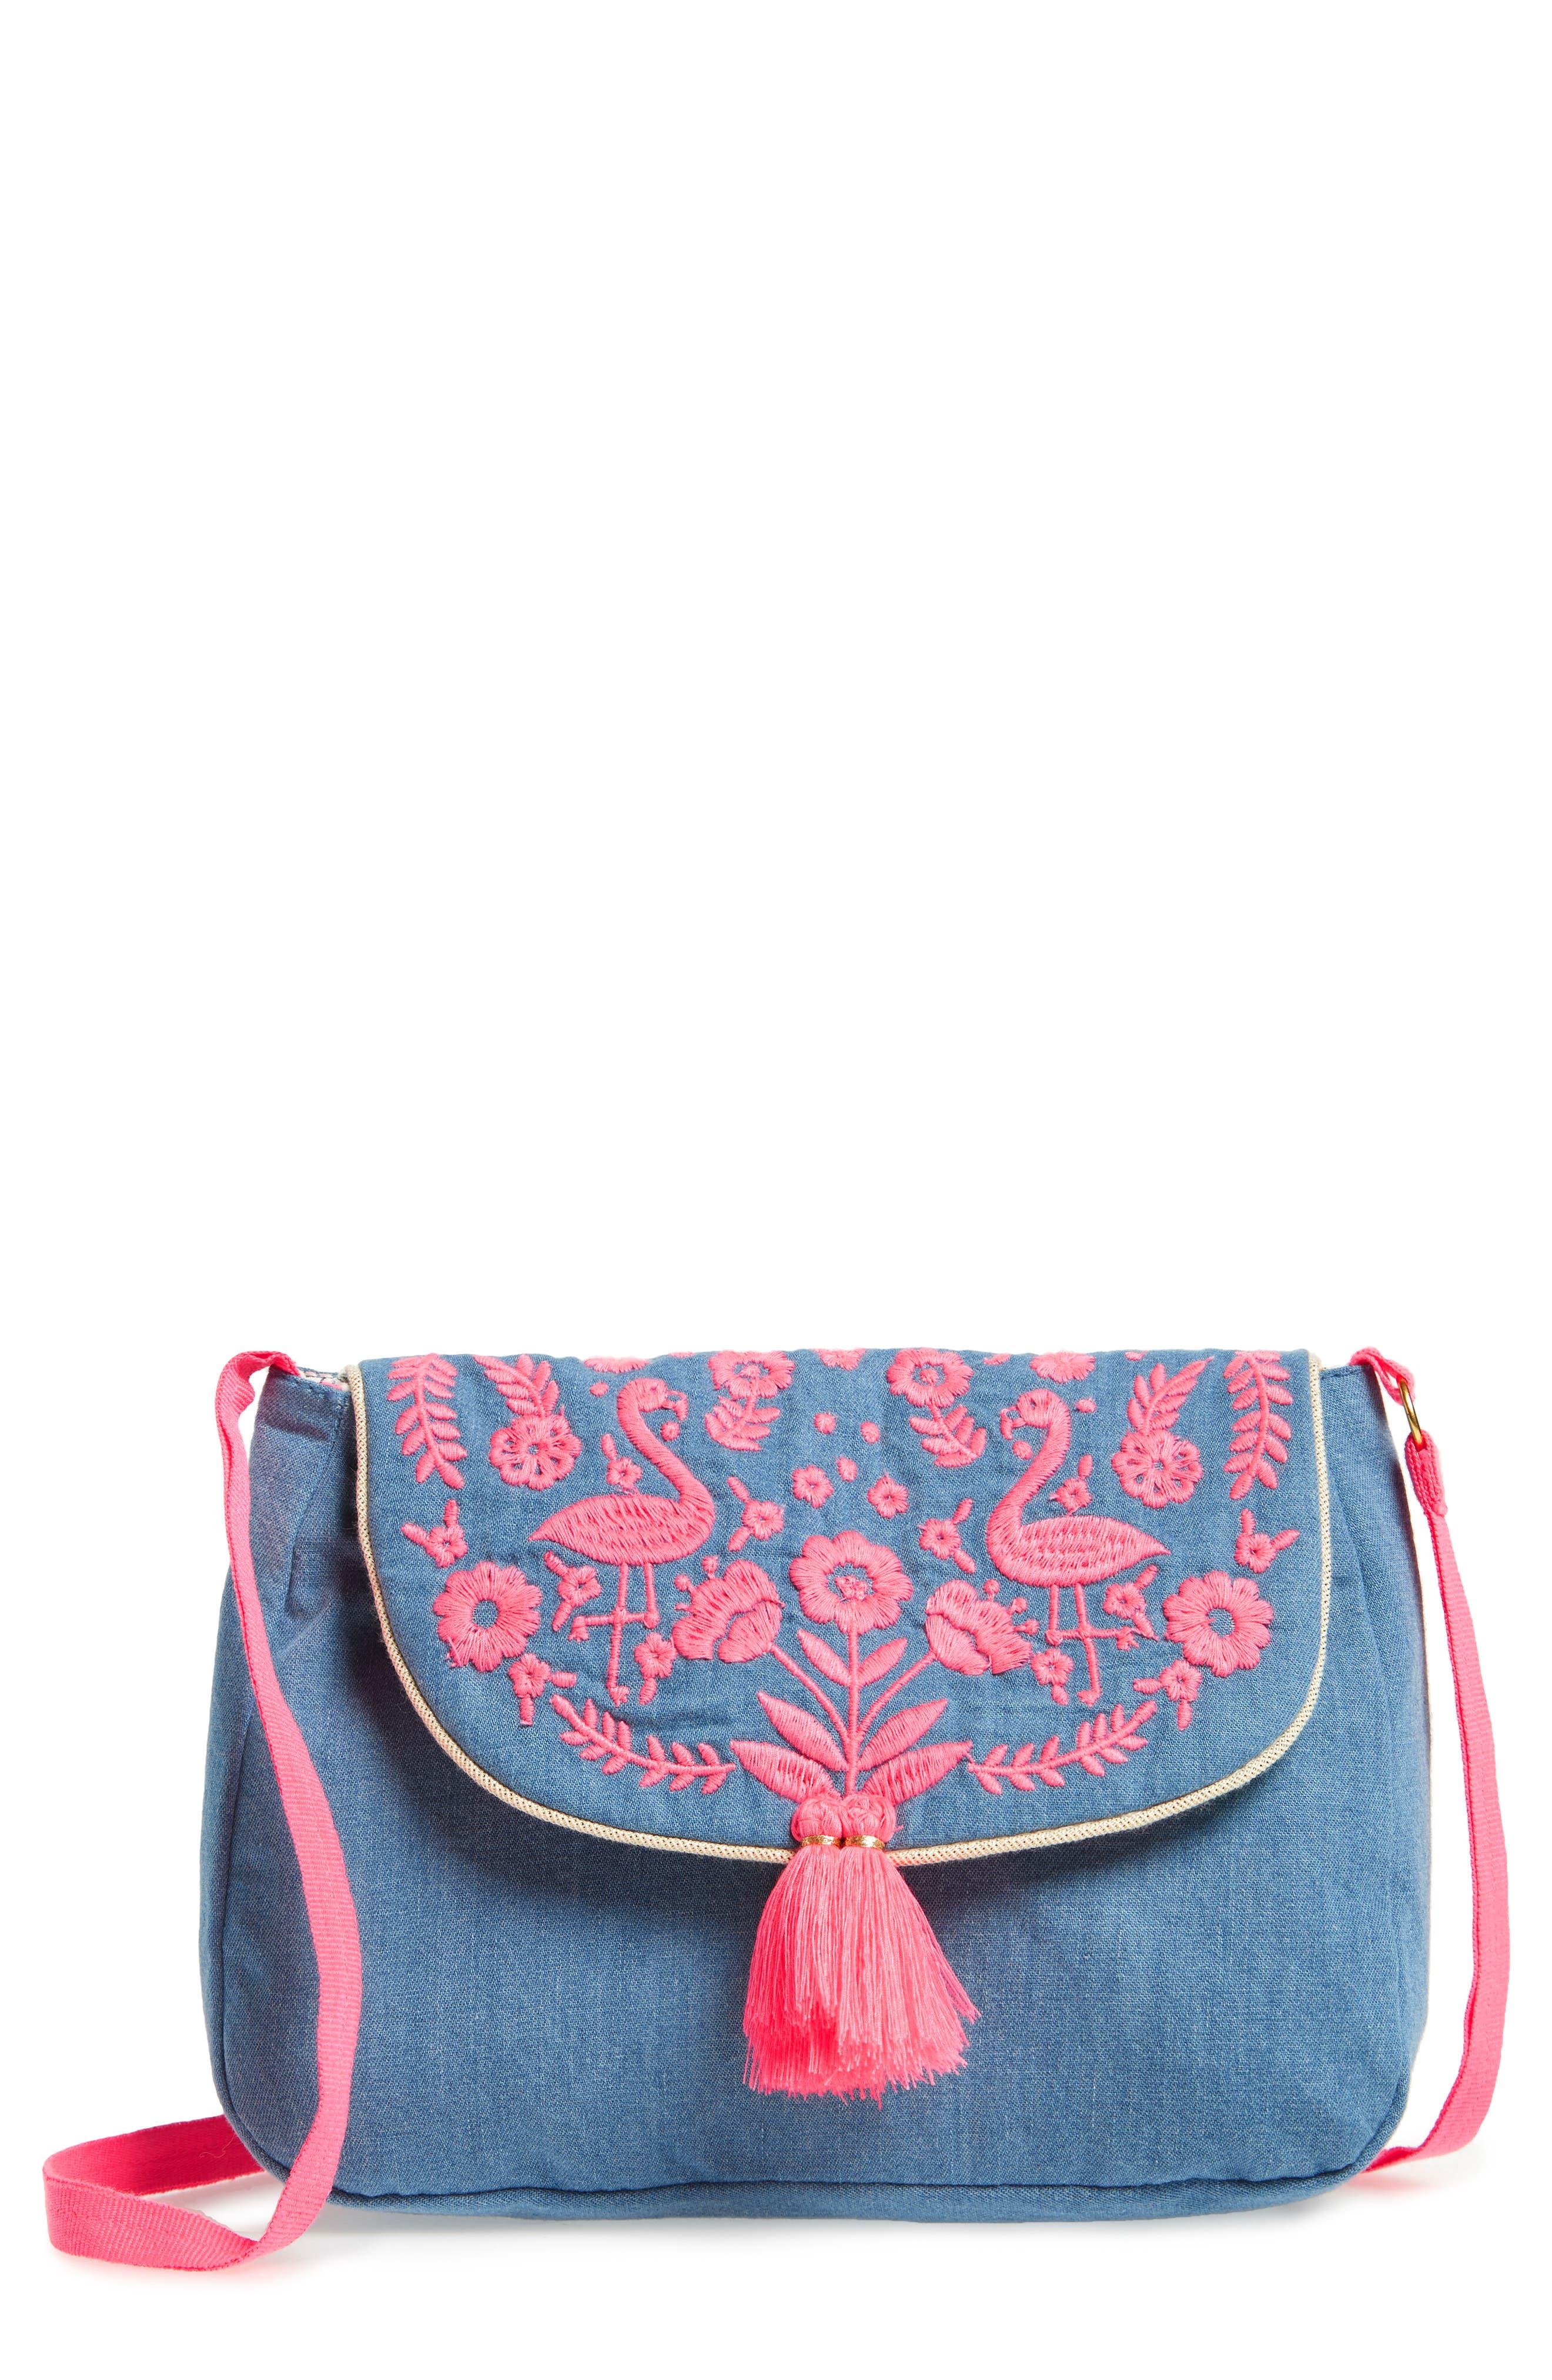 Embroidered Denim Shoulder Bag,                             Main thumbnail 1, color,                             Chambray Blue